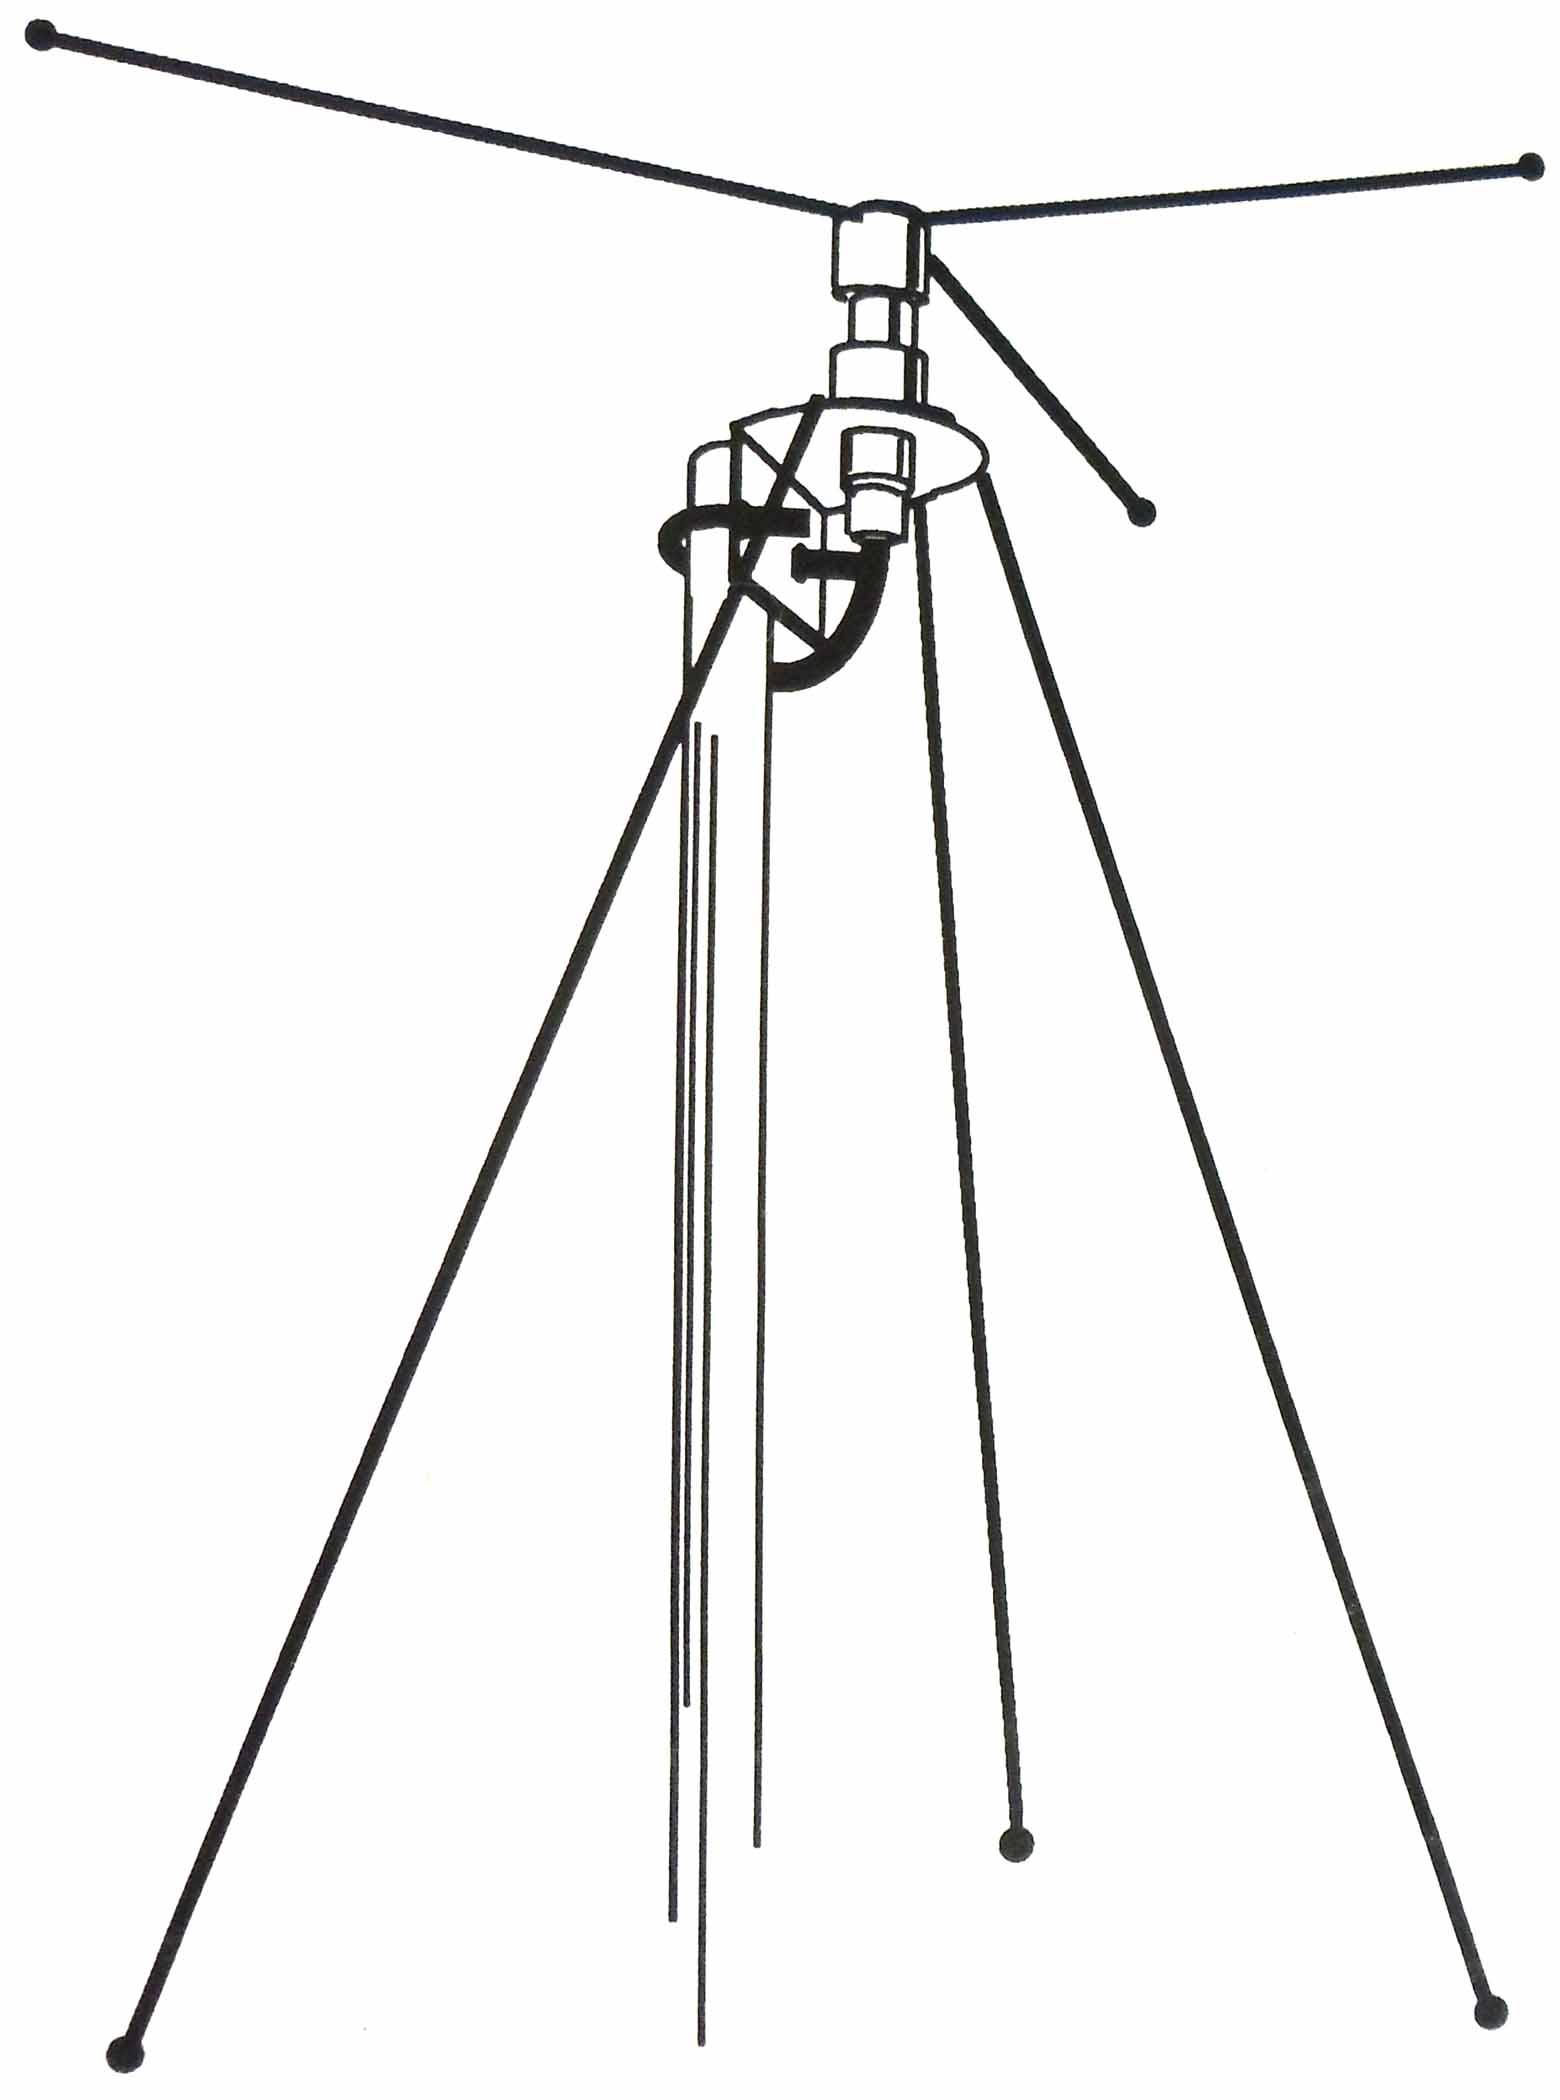 DCX - Hustler 40-666 MHz Discone Base Station Scanner Antenna